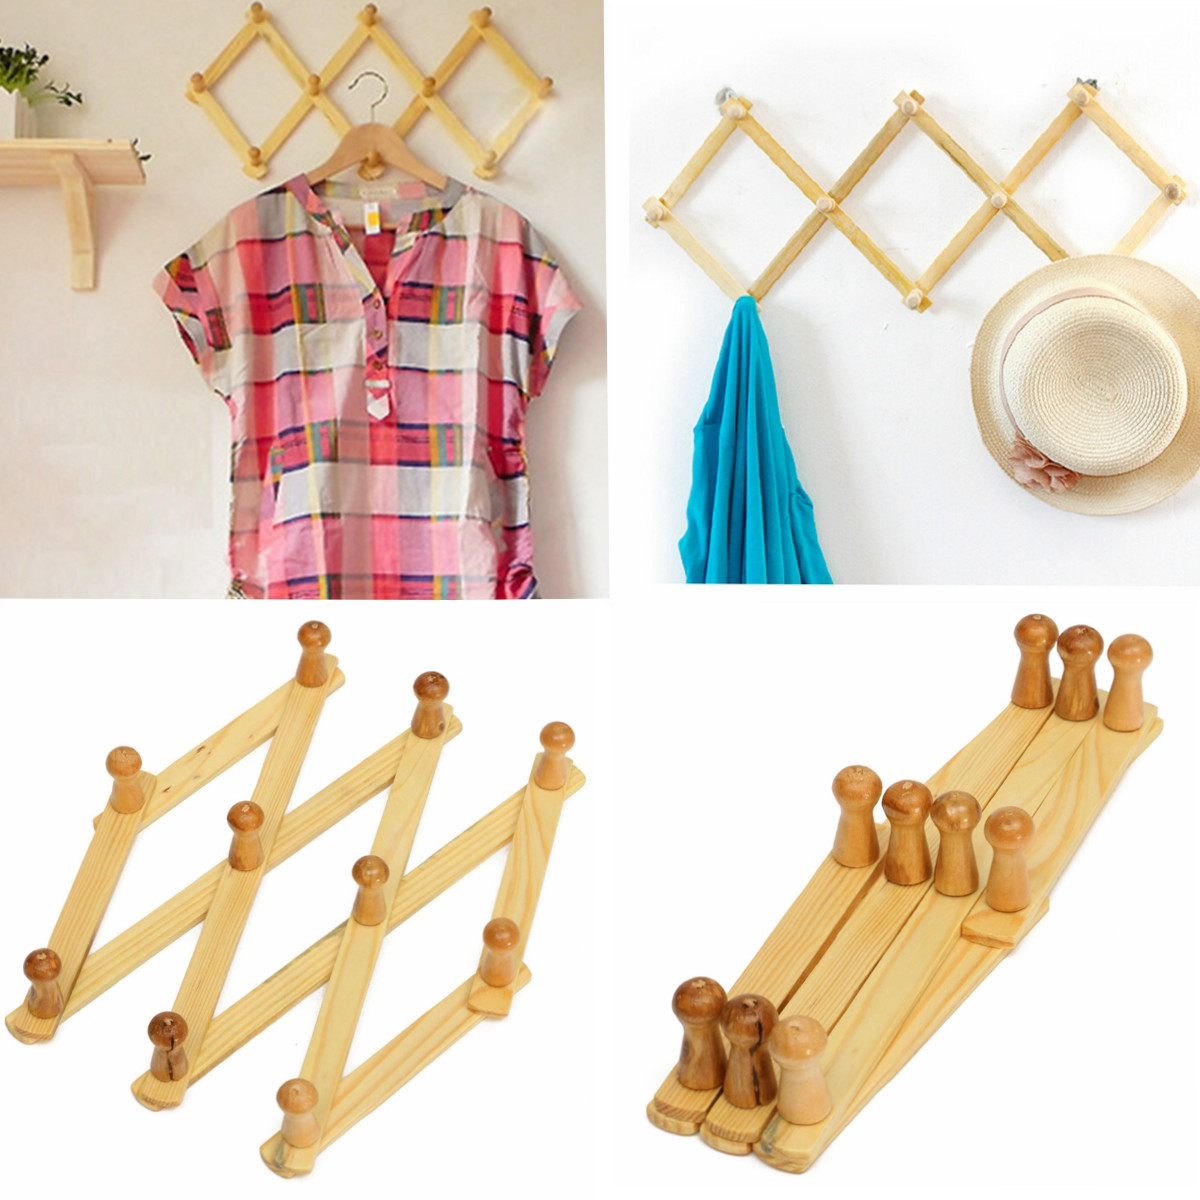 Wooden Expanding Clothes Hanger Expandable Coat Rack Holder Shelf Hat Closet Wall Hook Home Decor